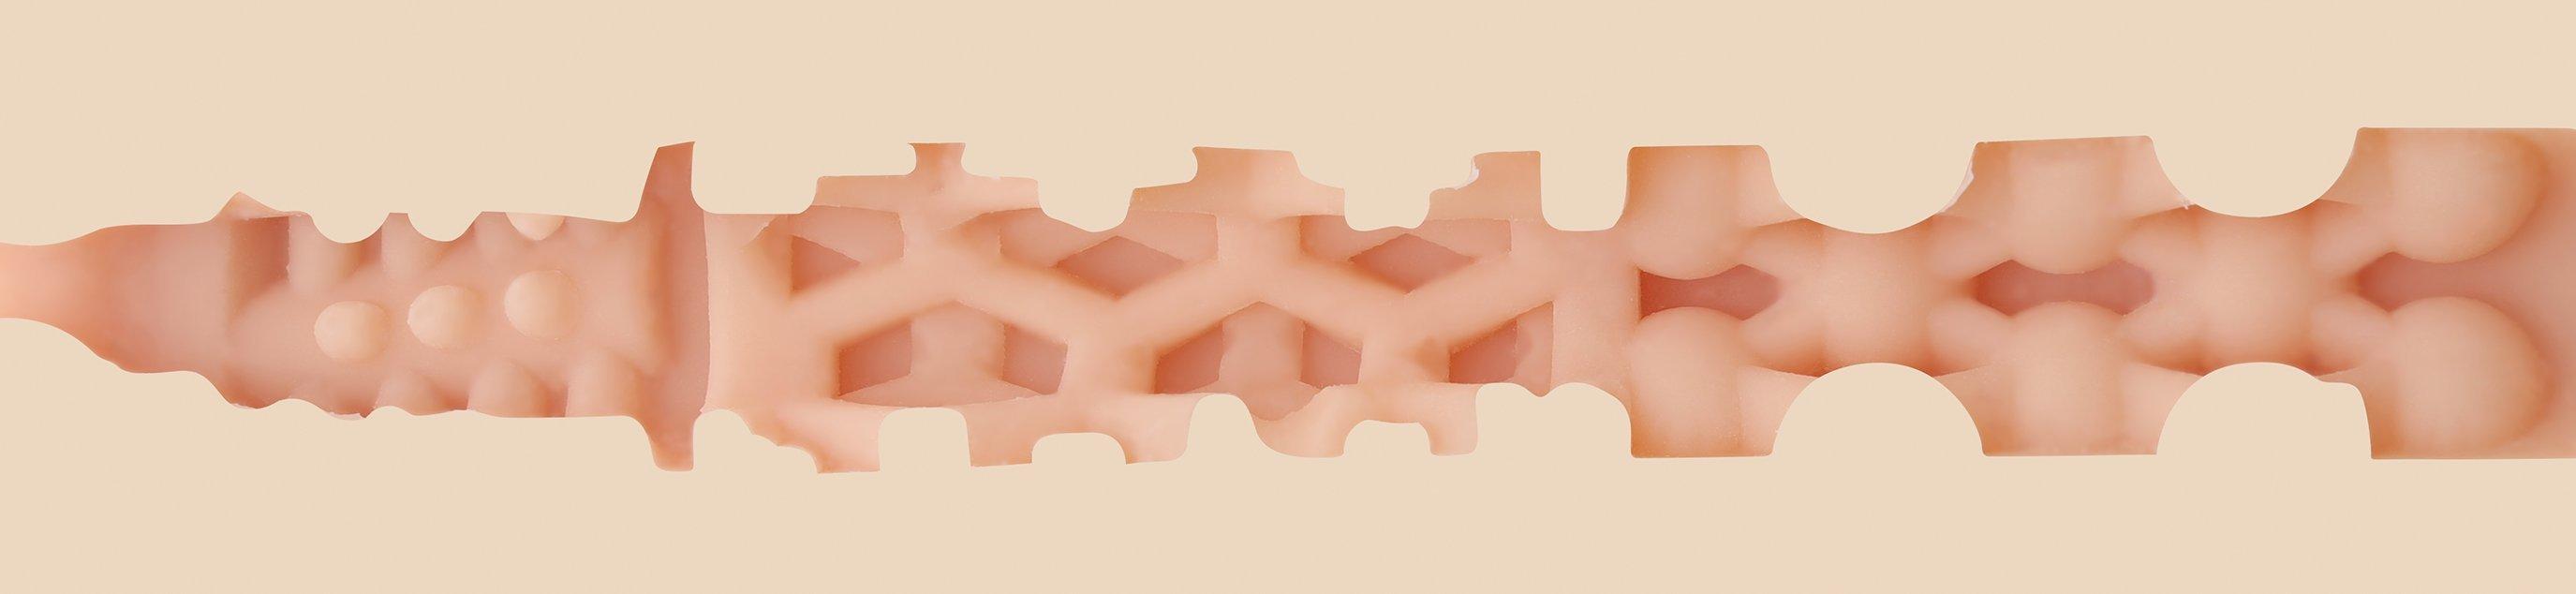 Shameless Texture Image